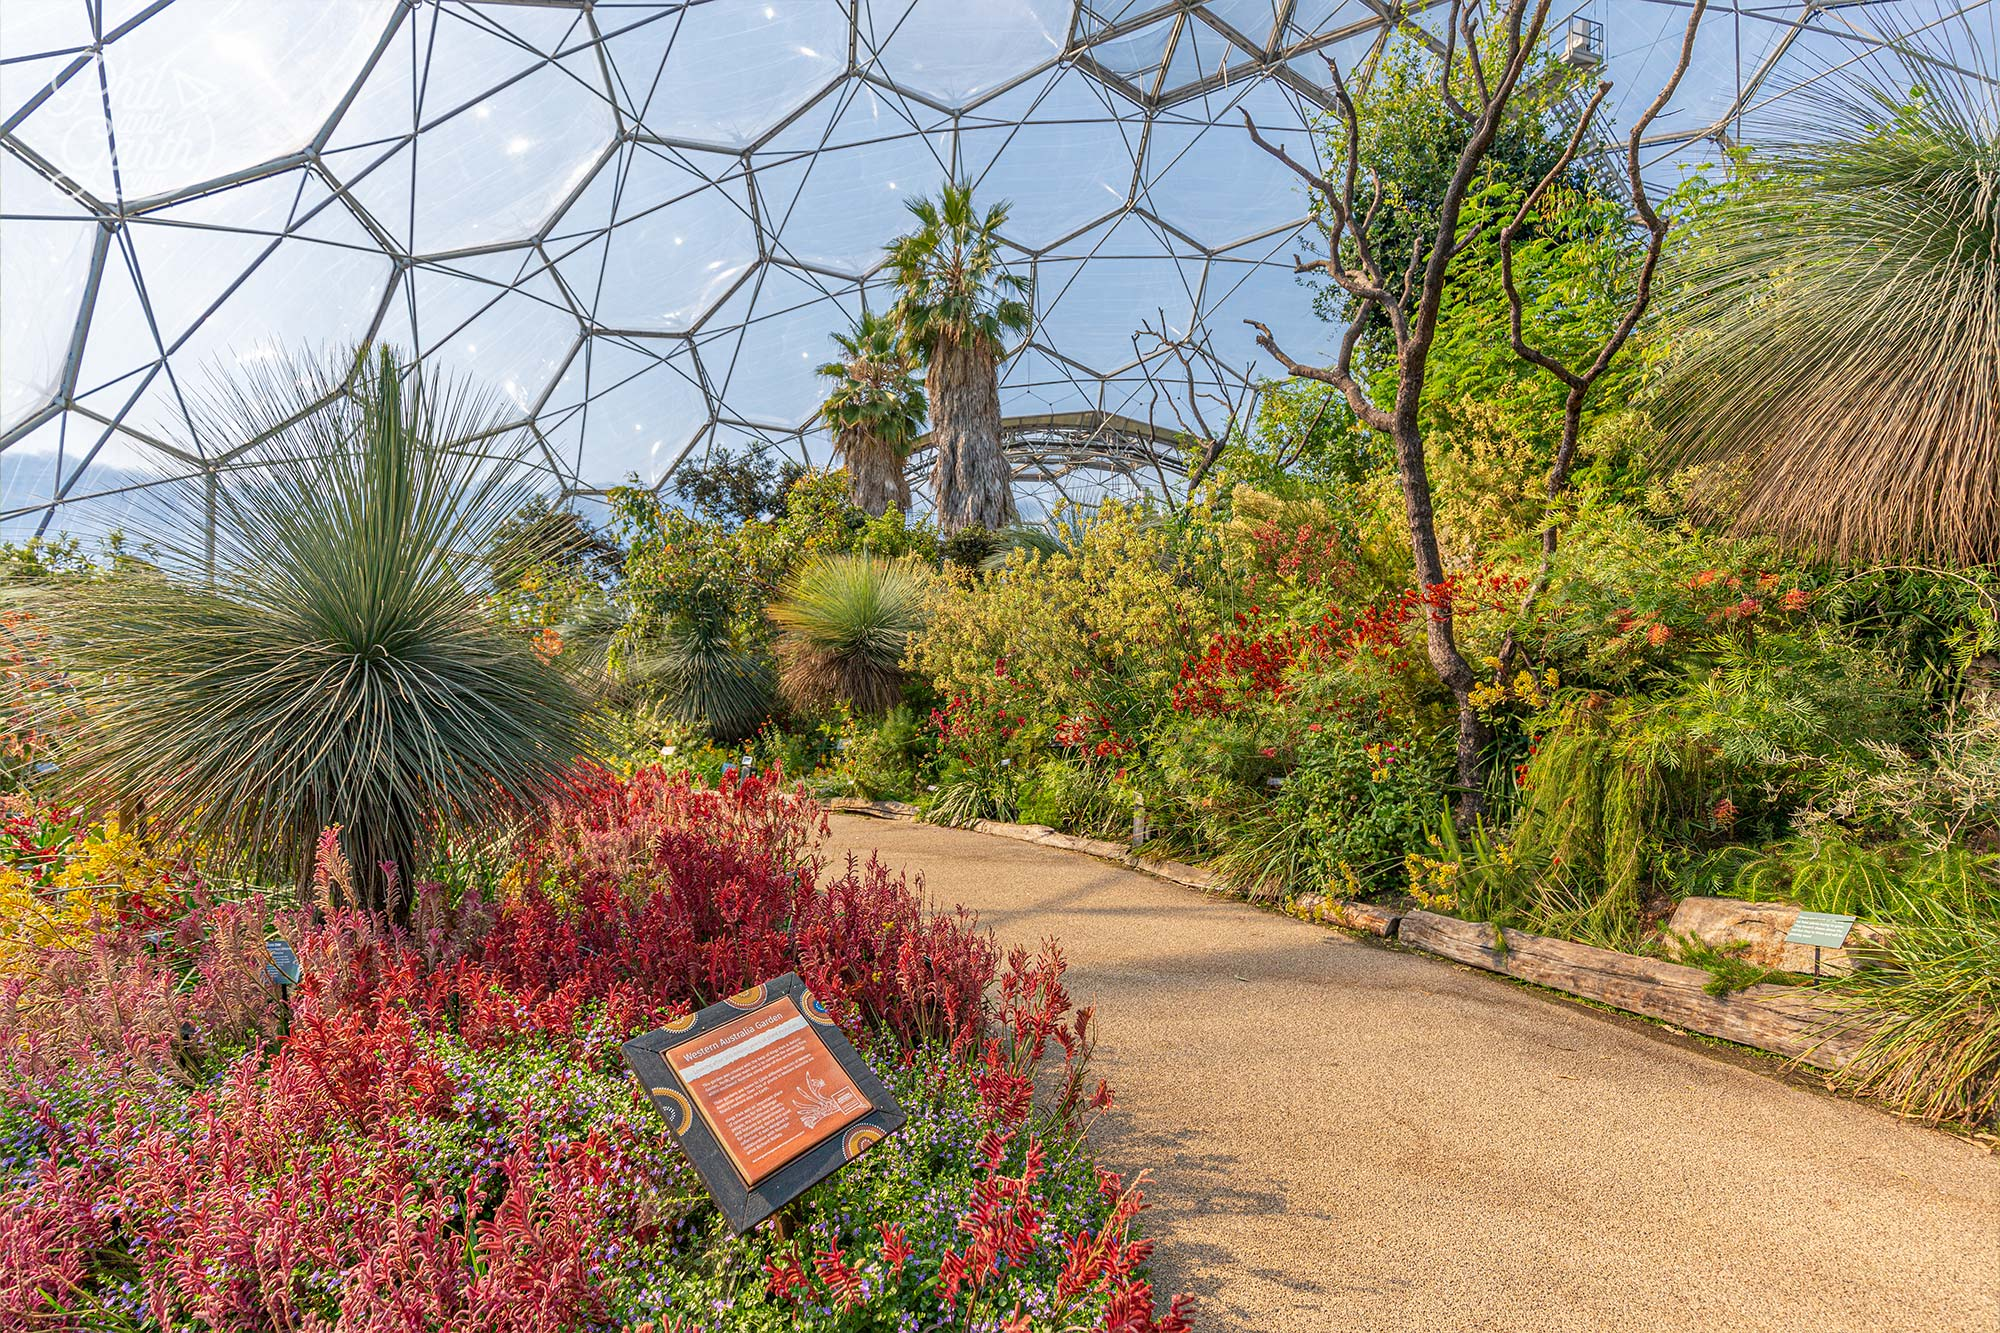 The colourful Western Australia garden inside the Mediterranean biome, Eden Project